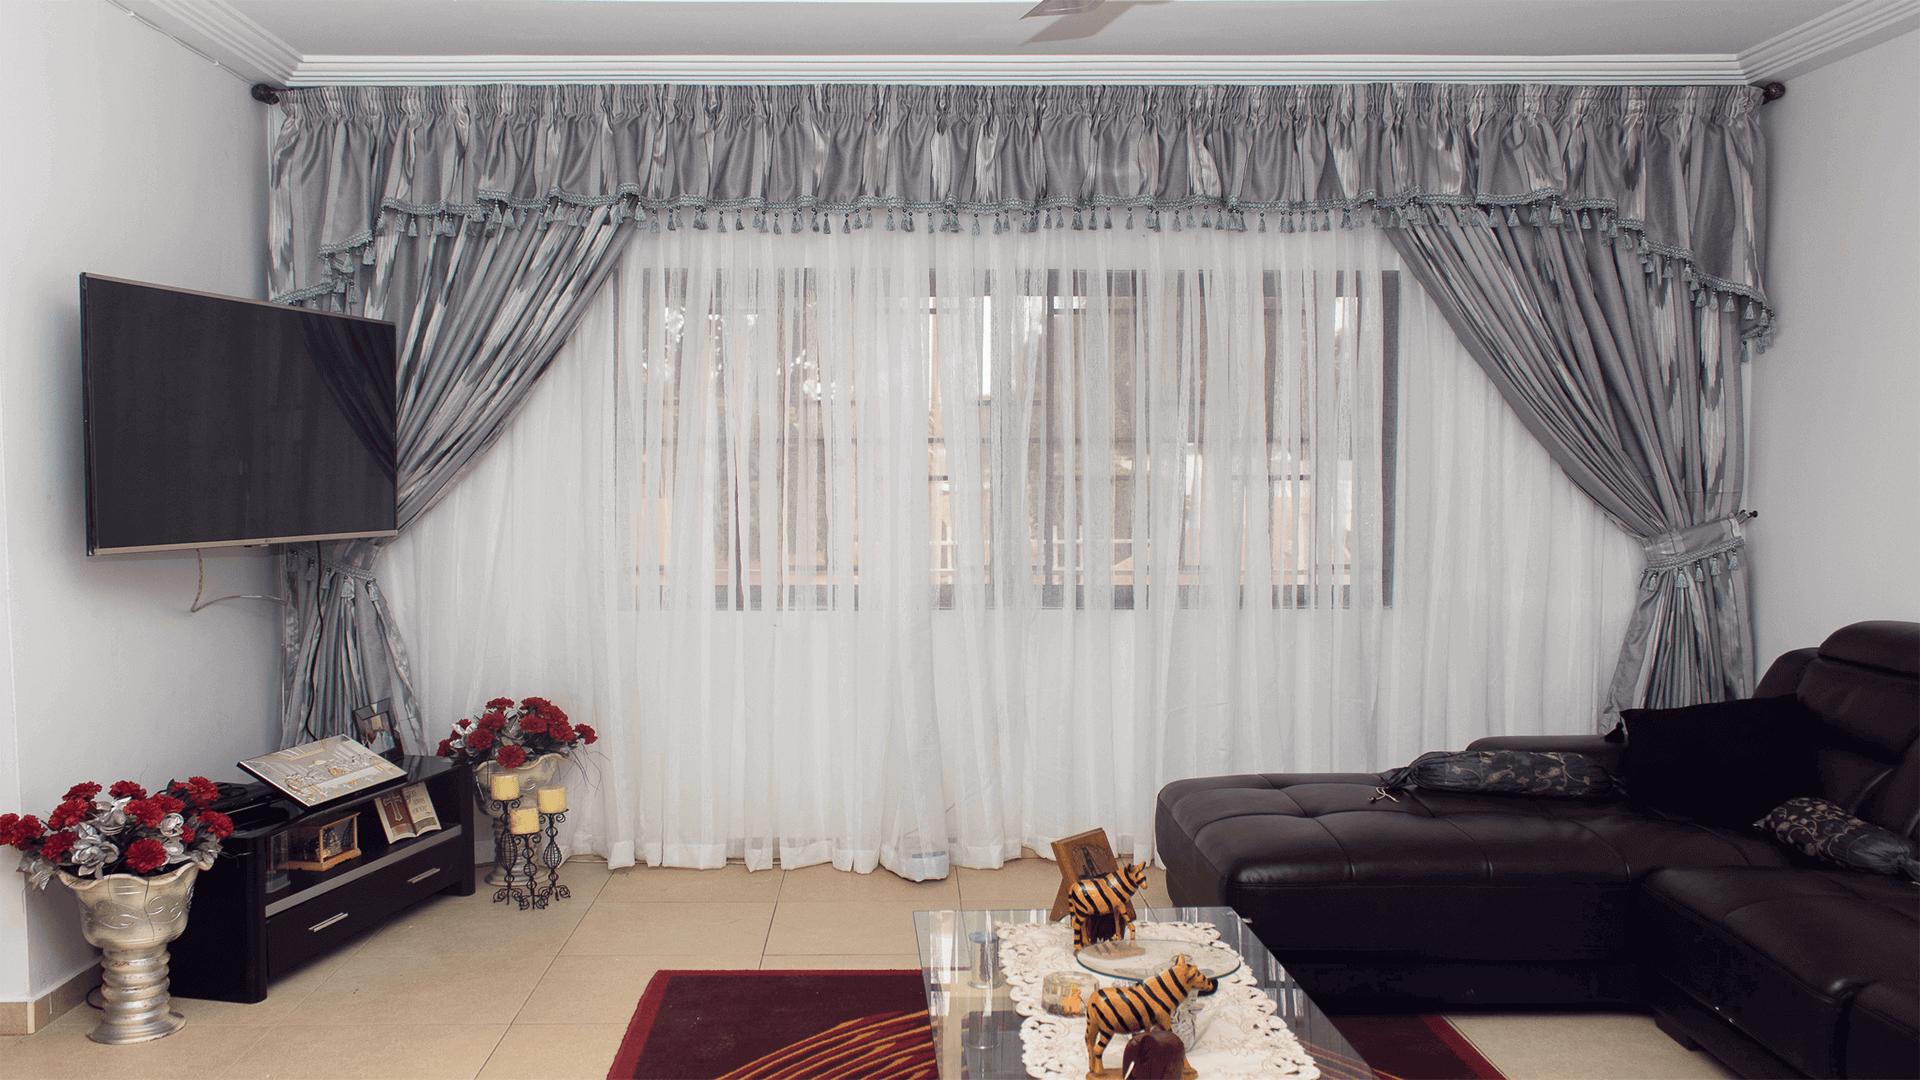 Best Interior Designers And Decorators In Ghana Silwet Interiors